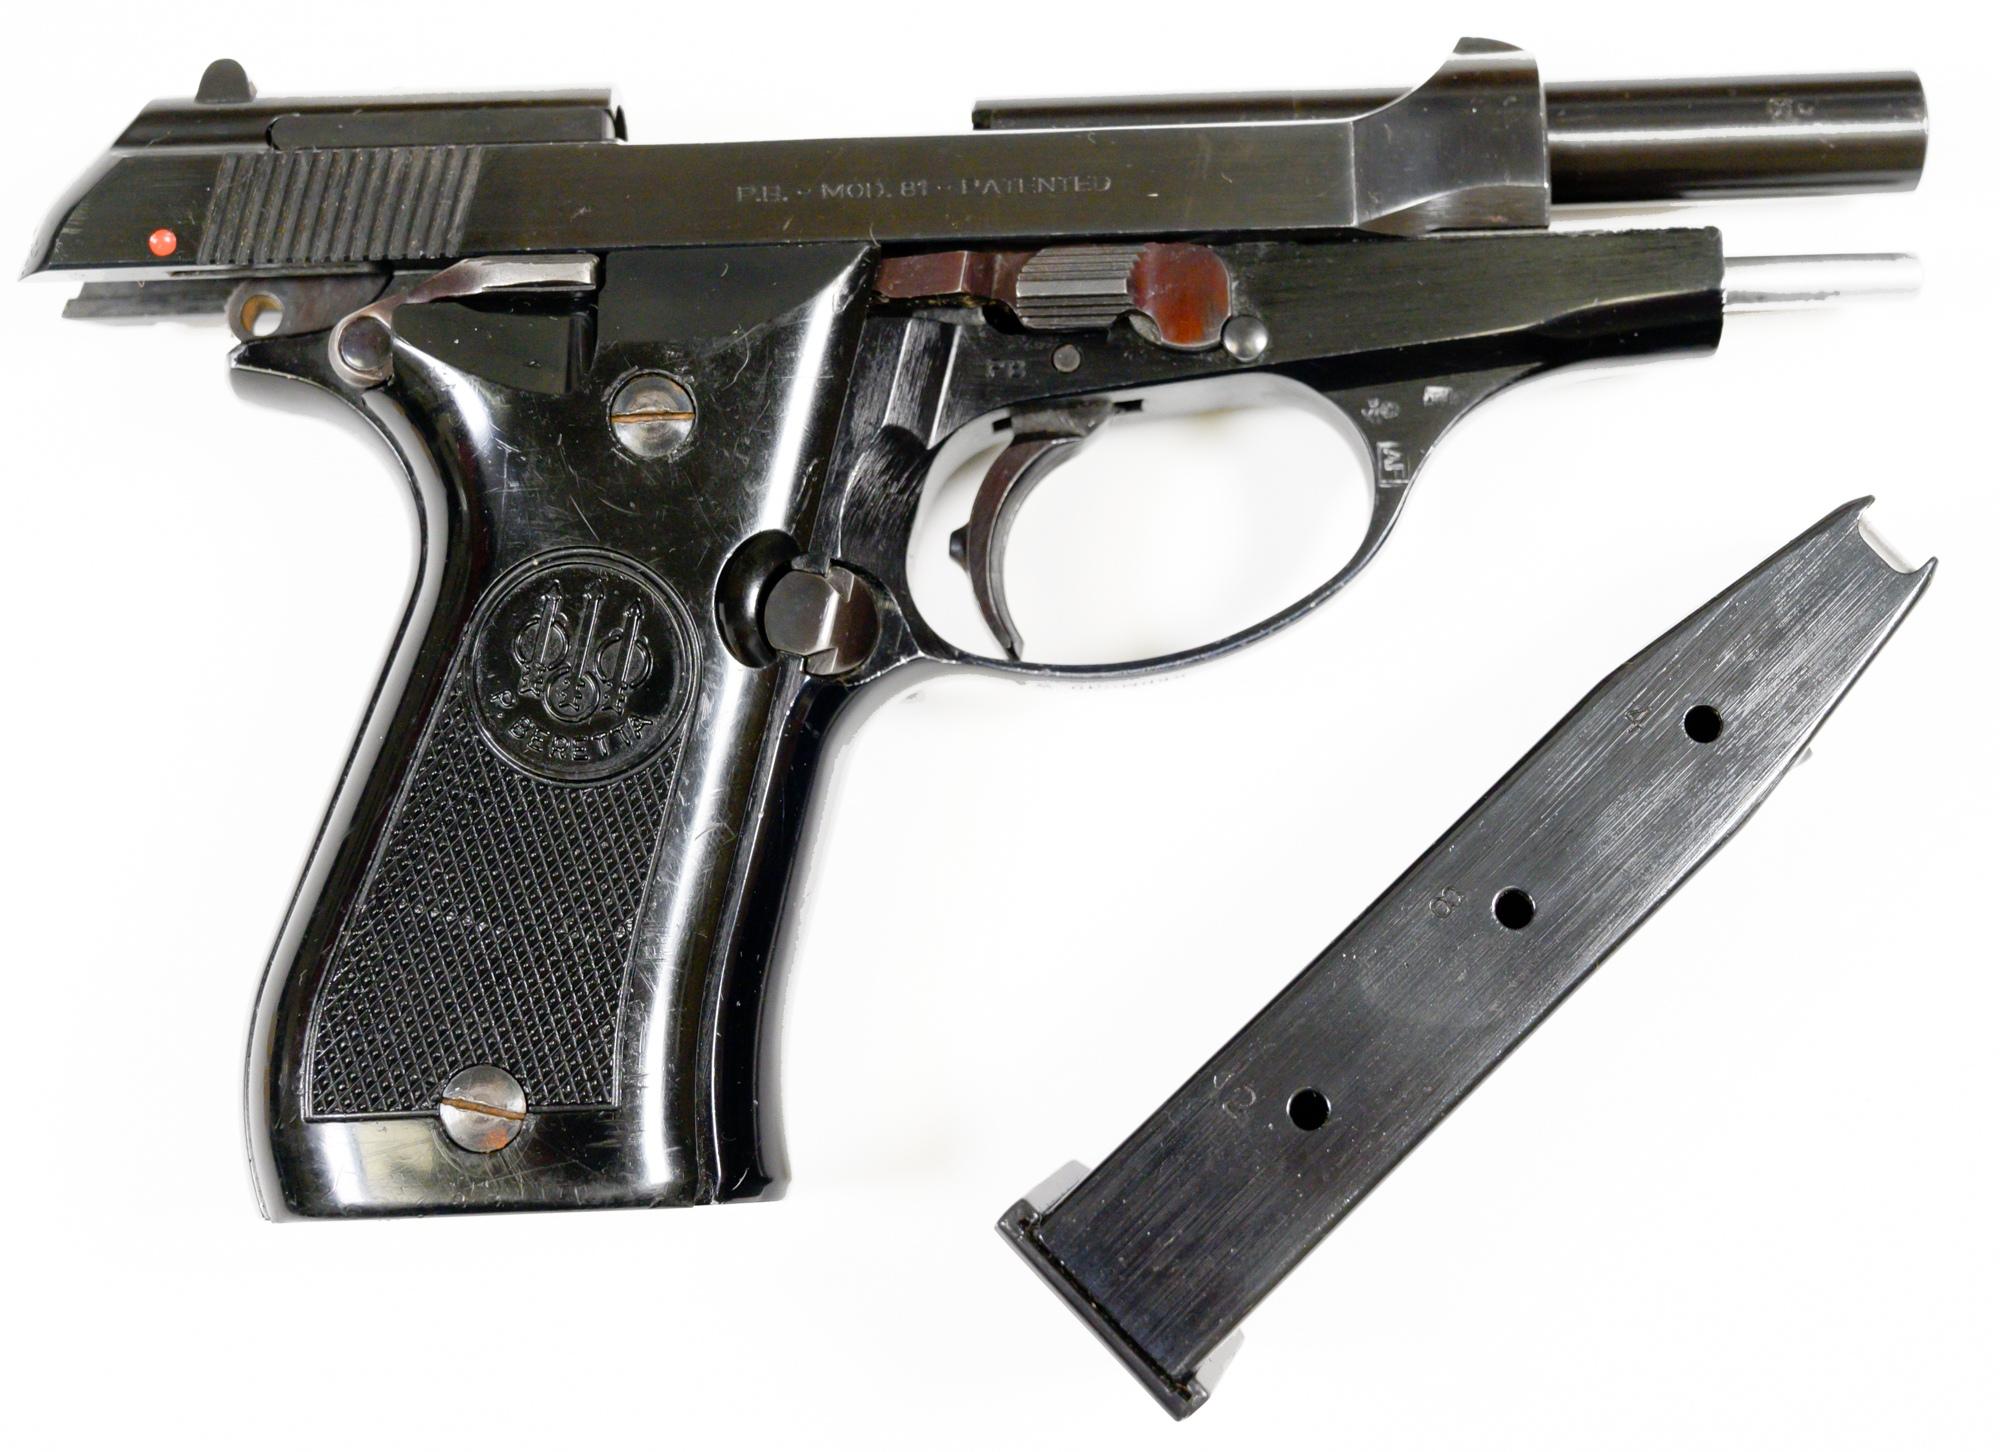 Surplus Beretta Model 81 Cheetah  32 ACP · For Sale · DK Firearms